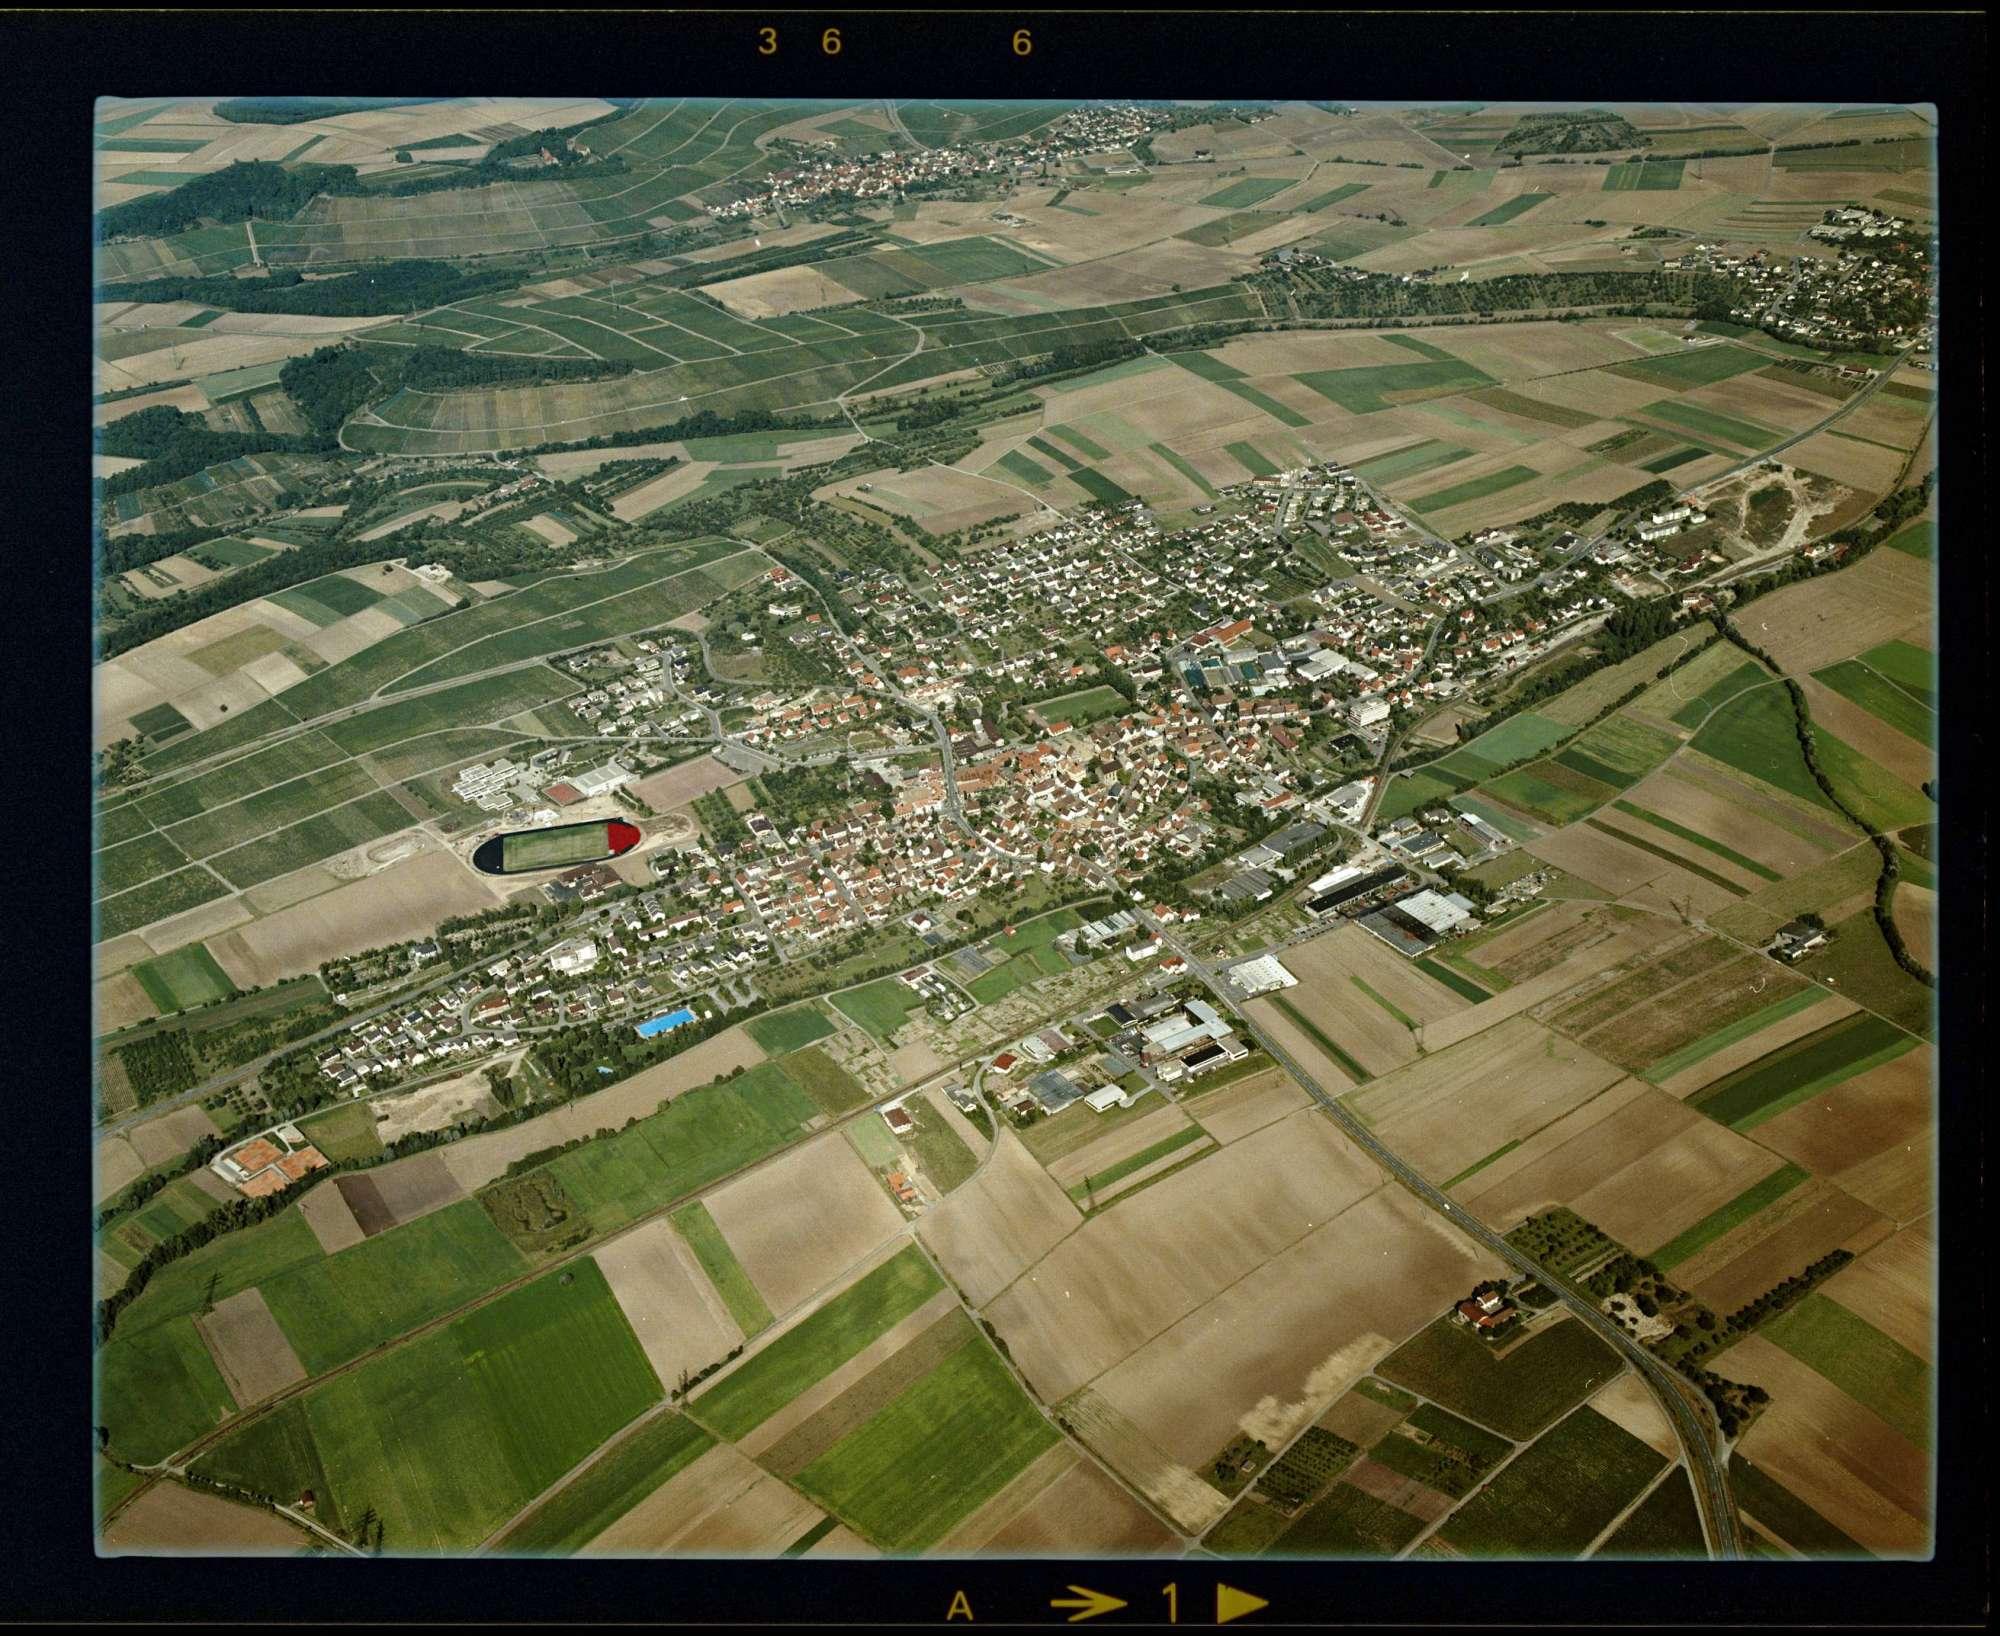 Güglingen, Luftbild, Bild 1